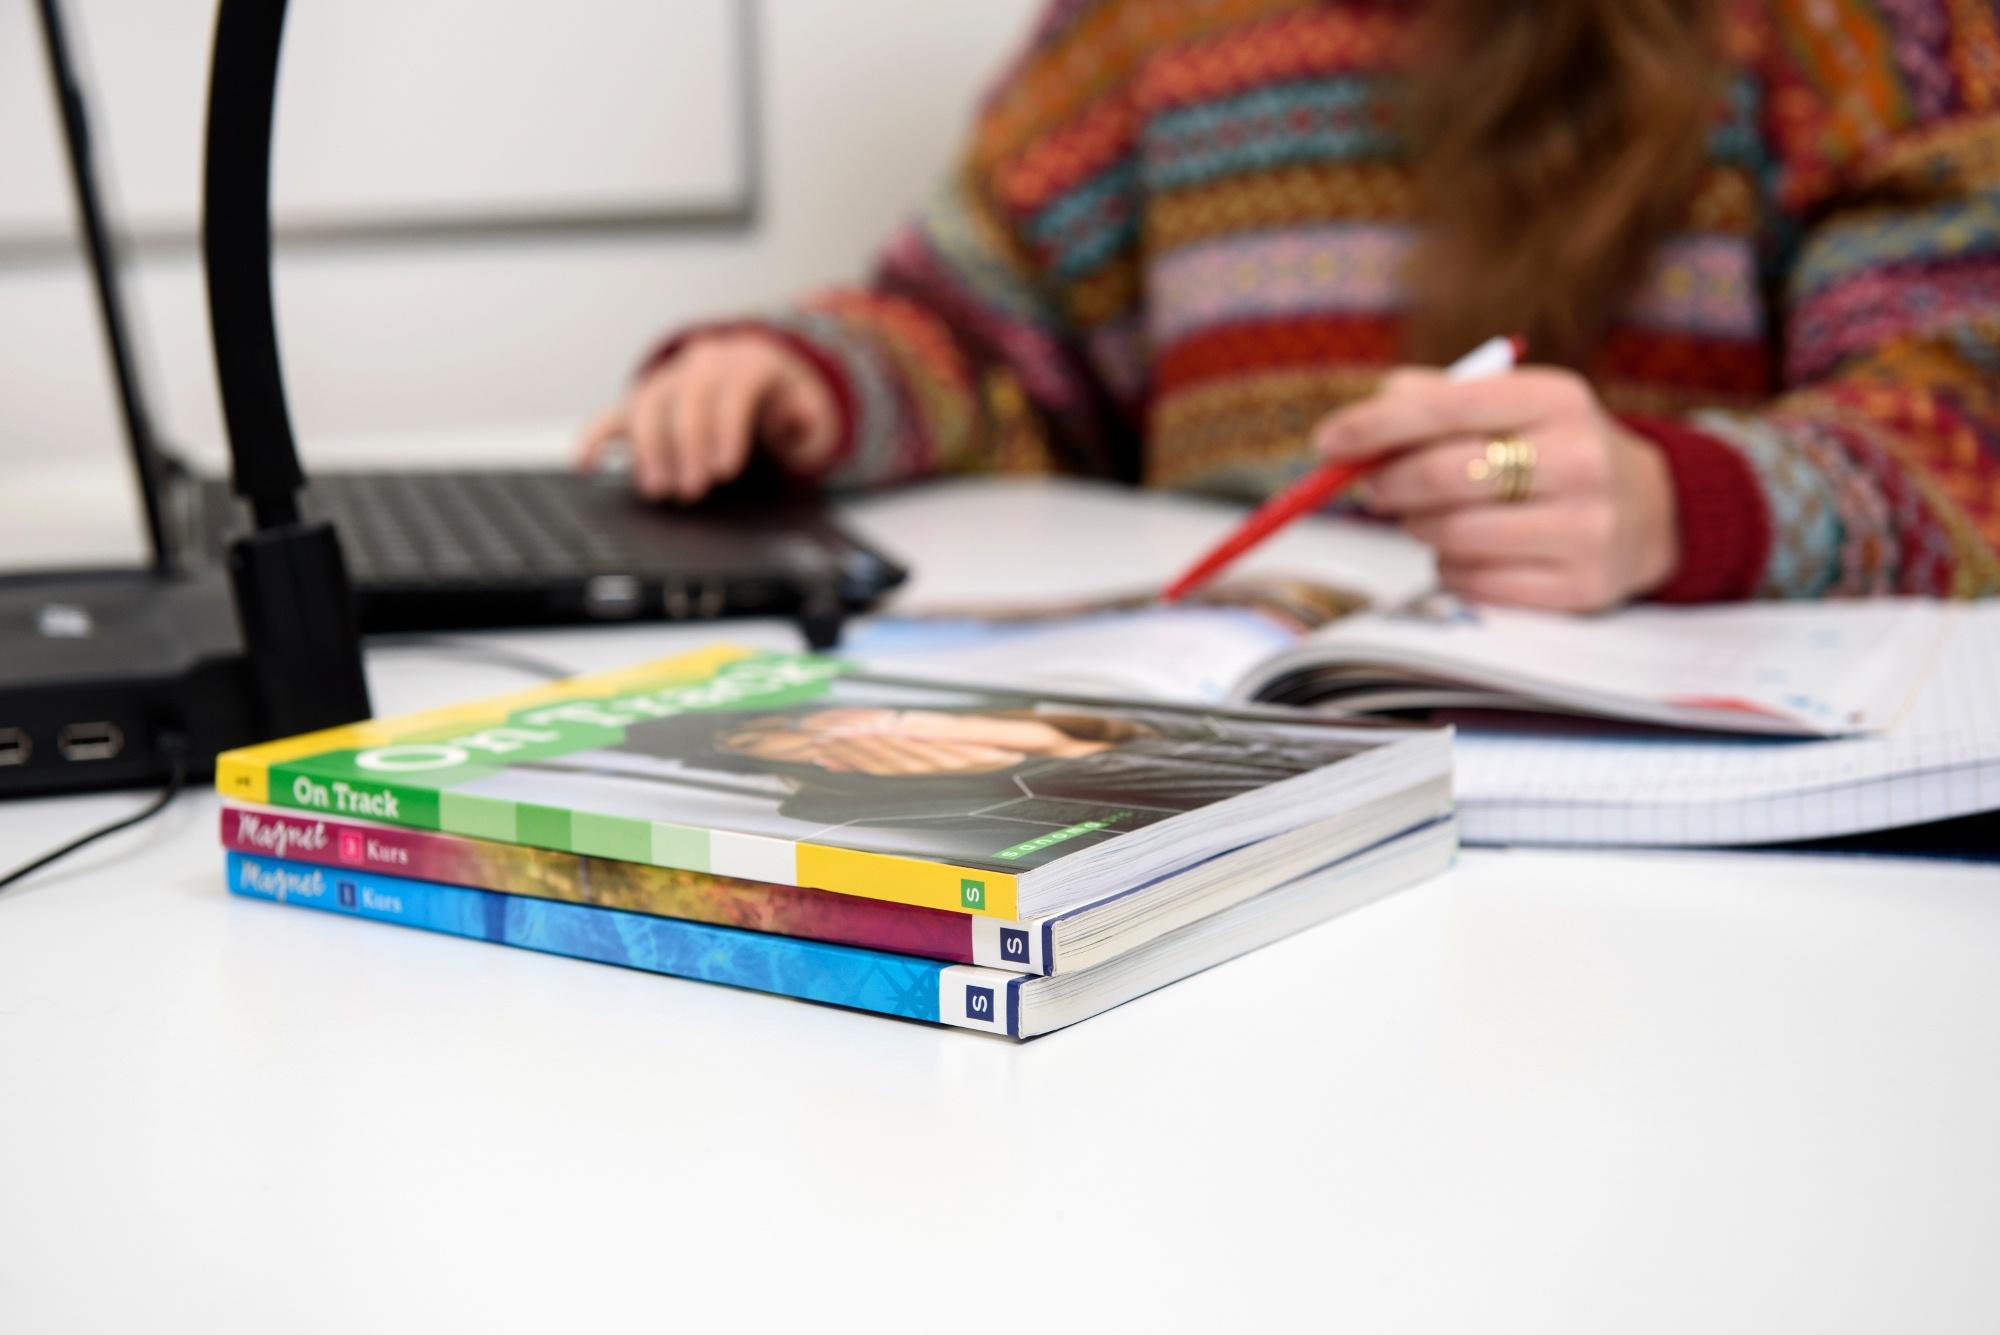 aikuisopiskelu online-opetus